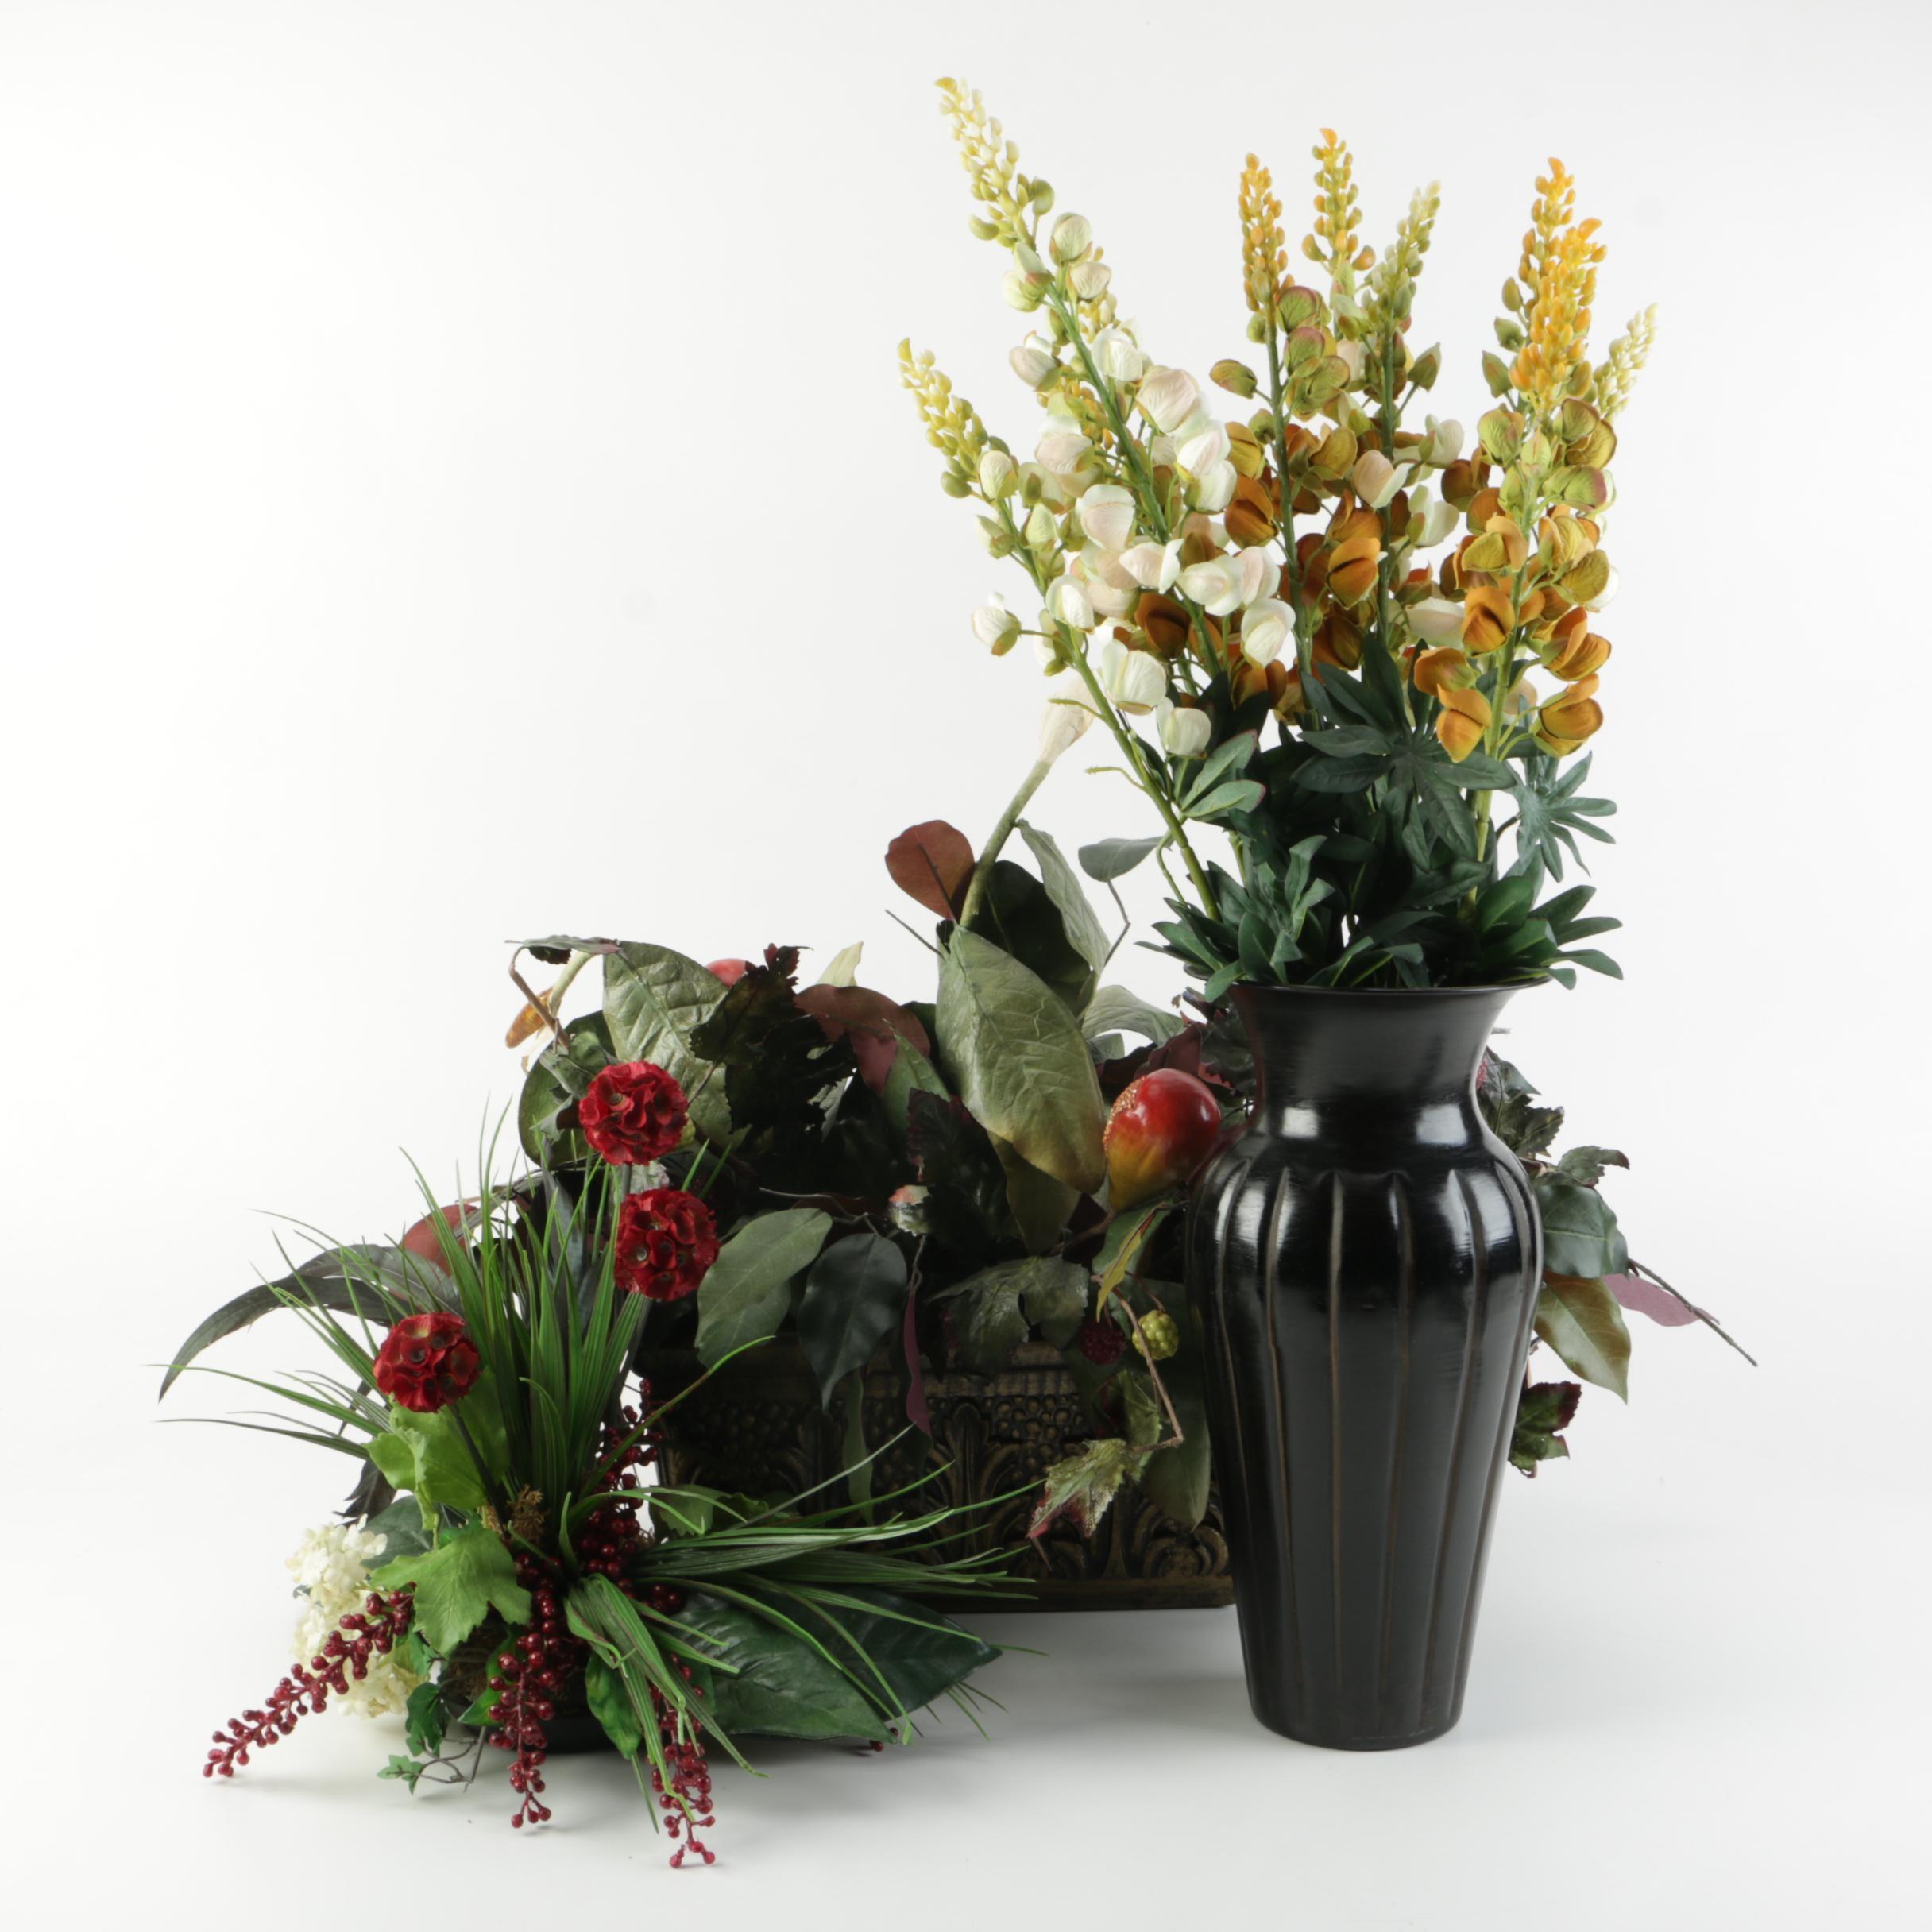 Floral Decor Assortment